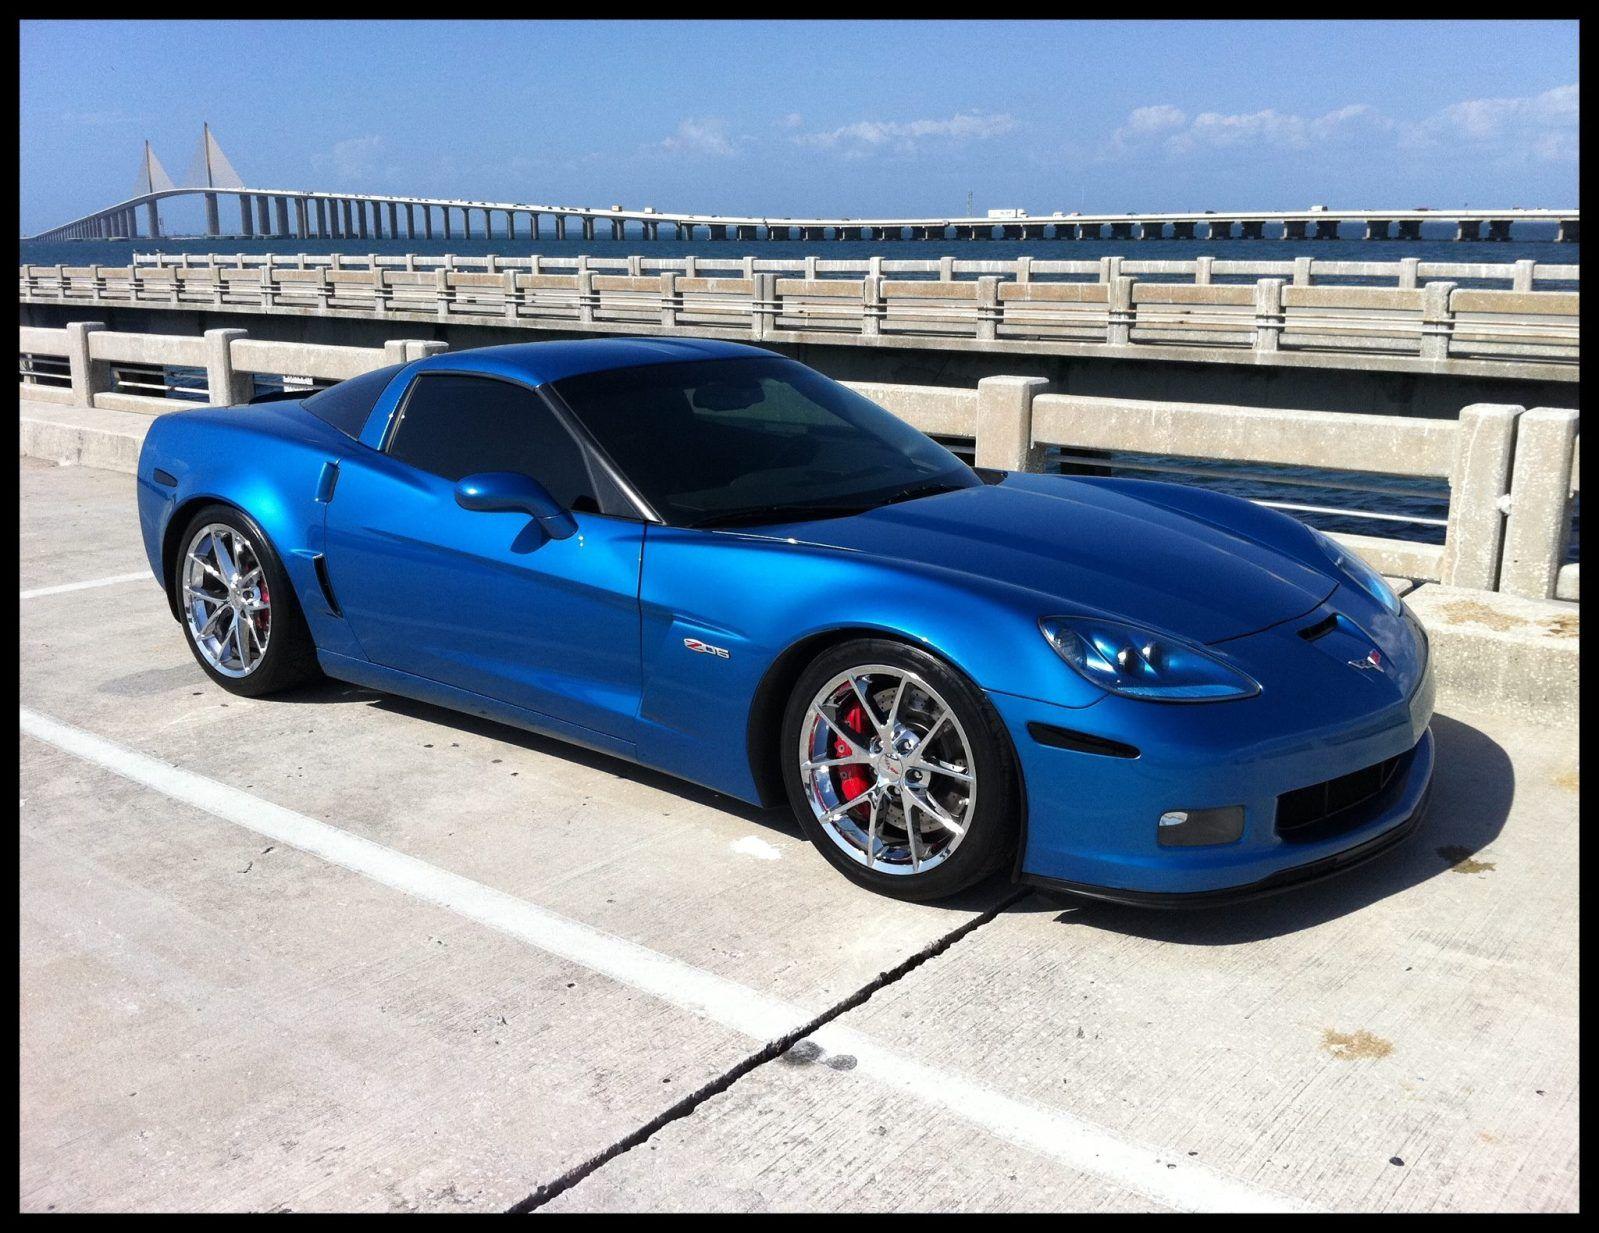 Chrome Zo6 Spider Wheels For Sale Corvette Forum Chevrolet Corvette Corvette Chevrolet Corvette Z06